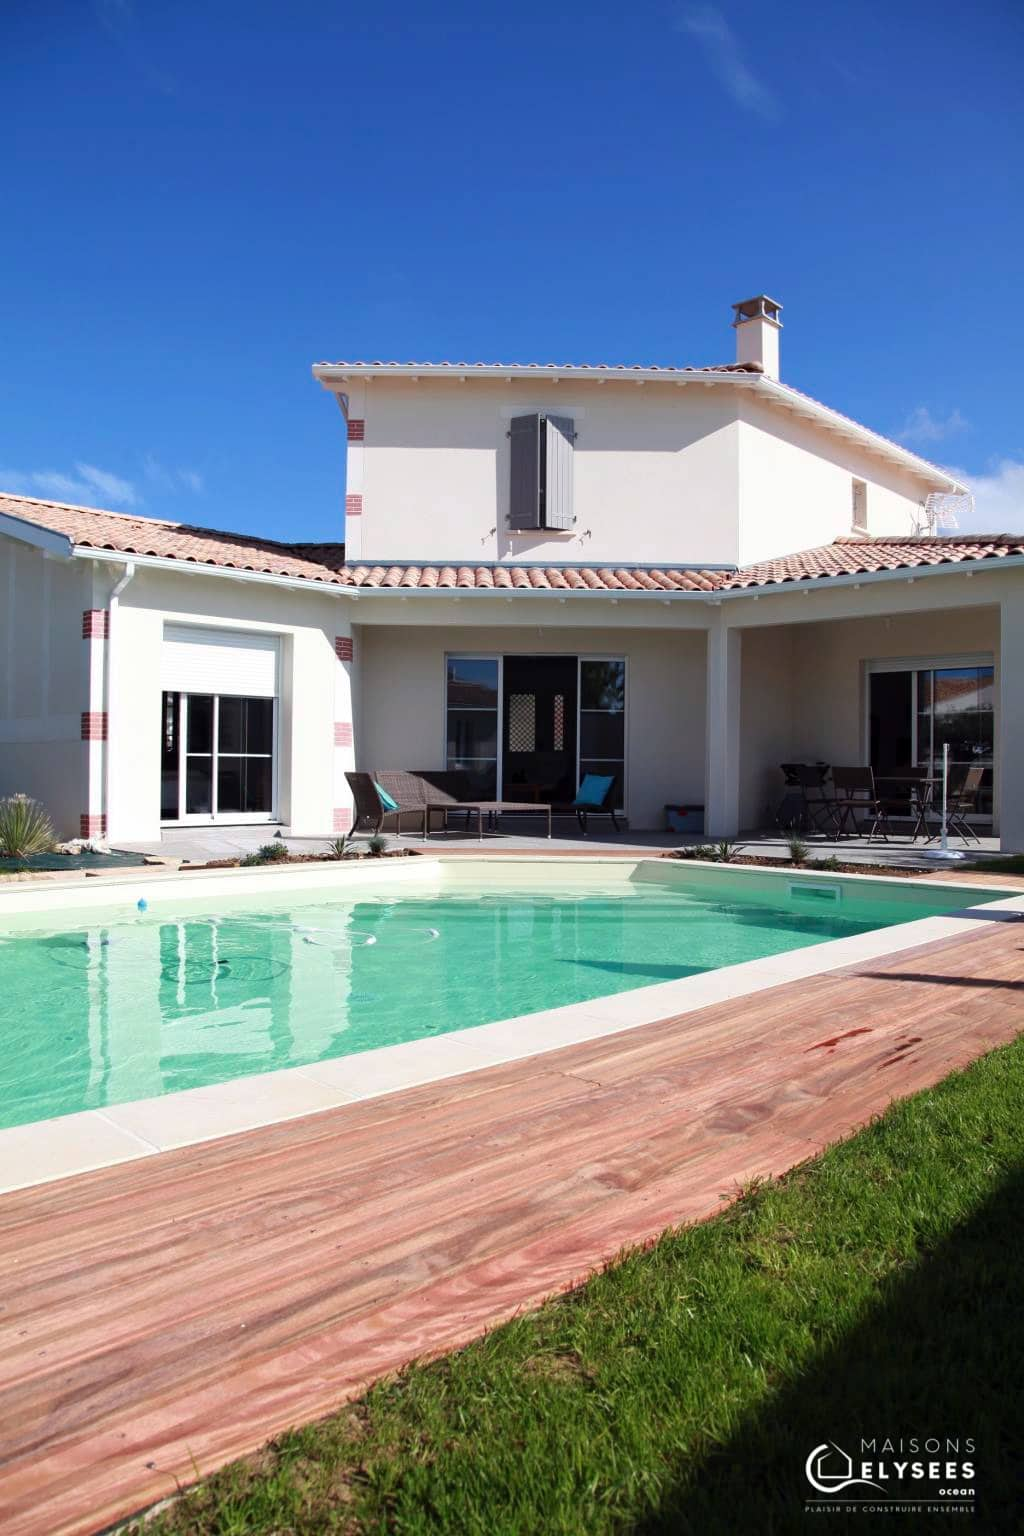 piscine-maison-balneaire-saint-palais-17-062013VIA